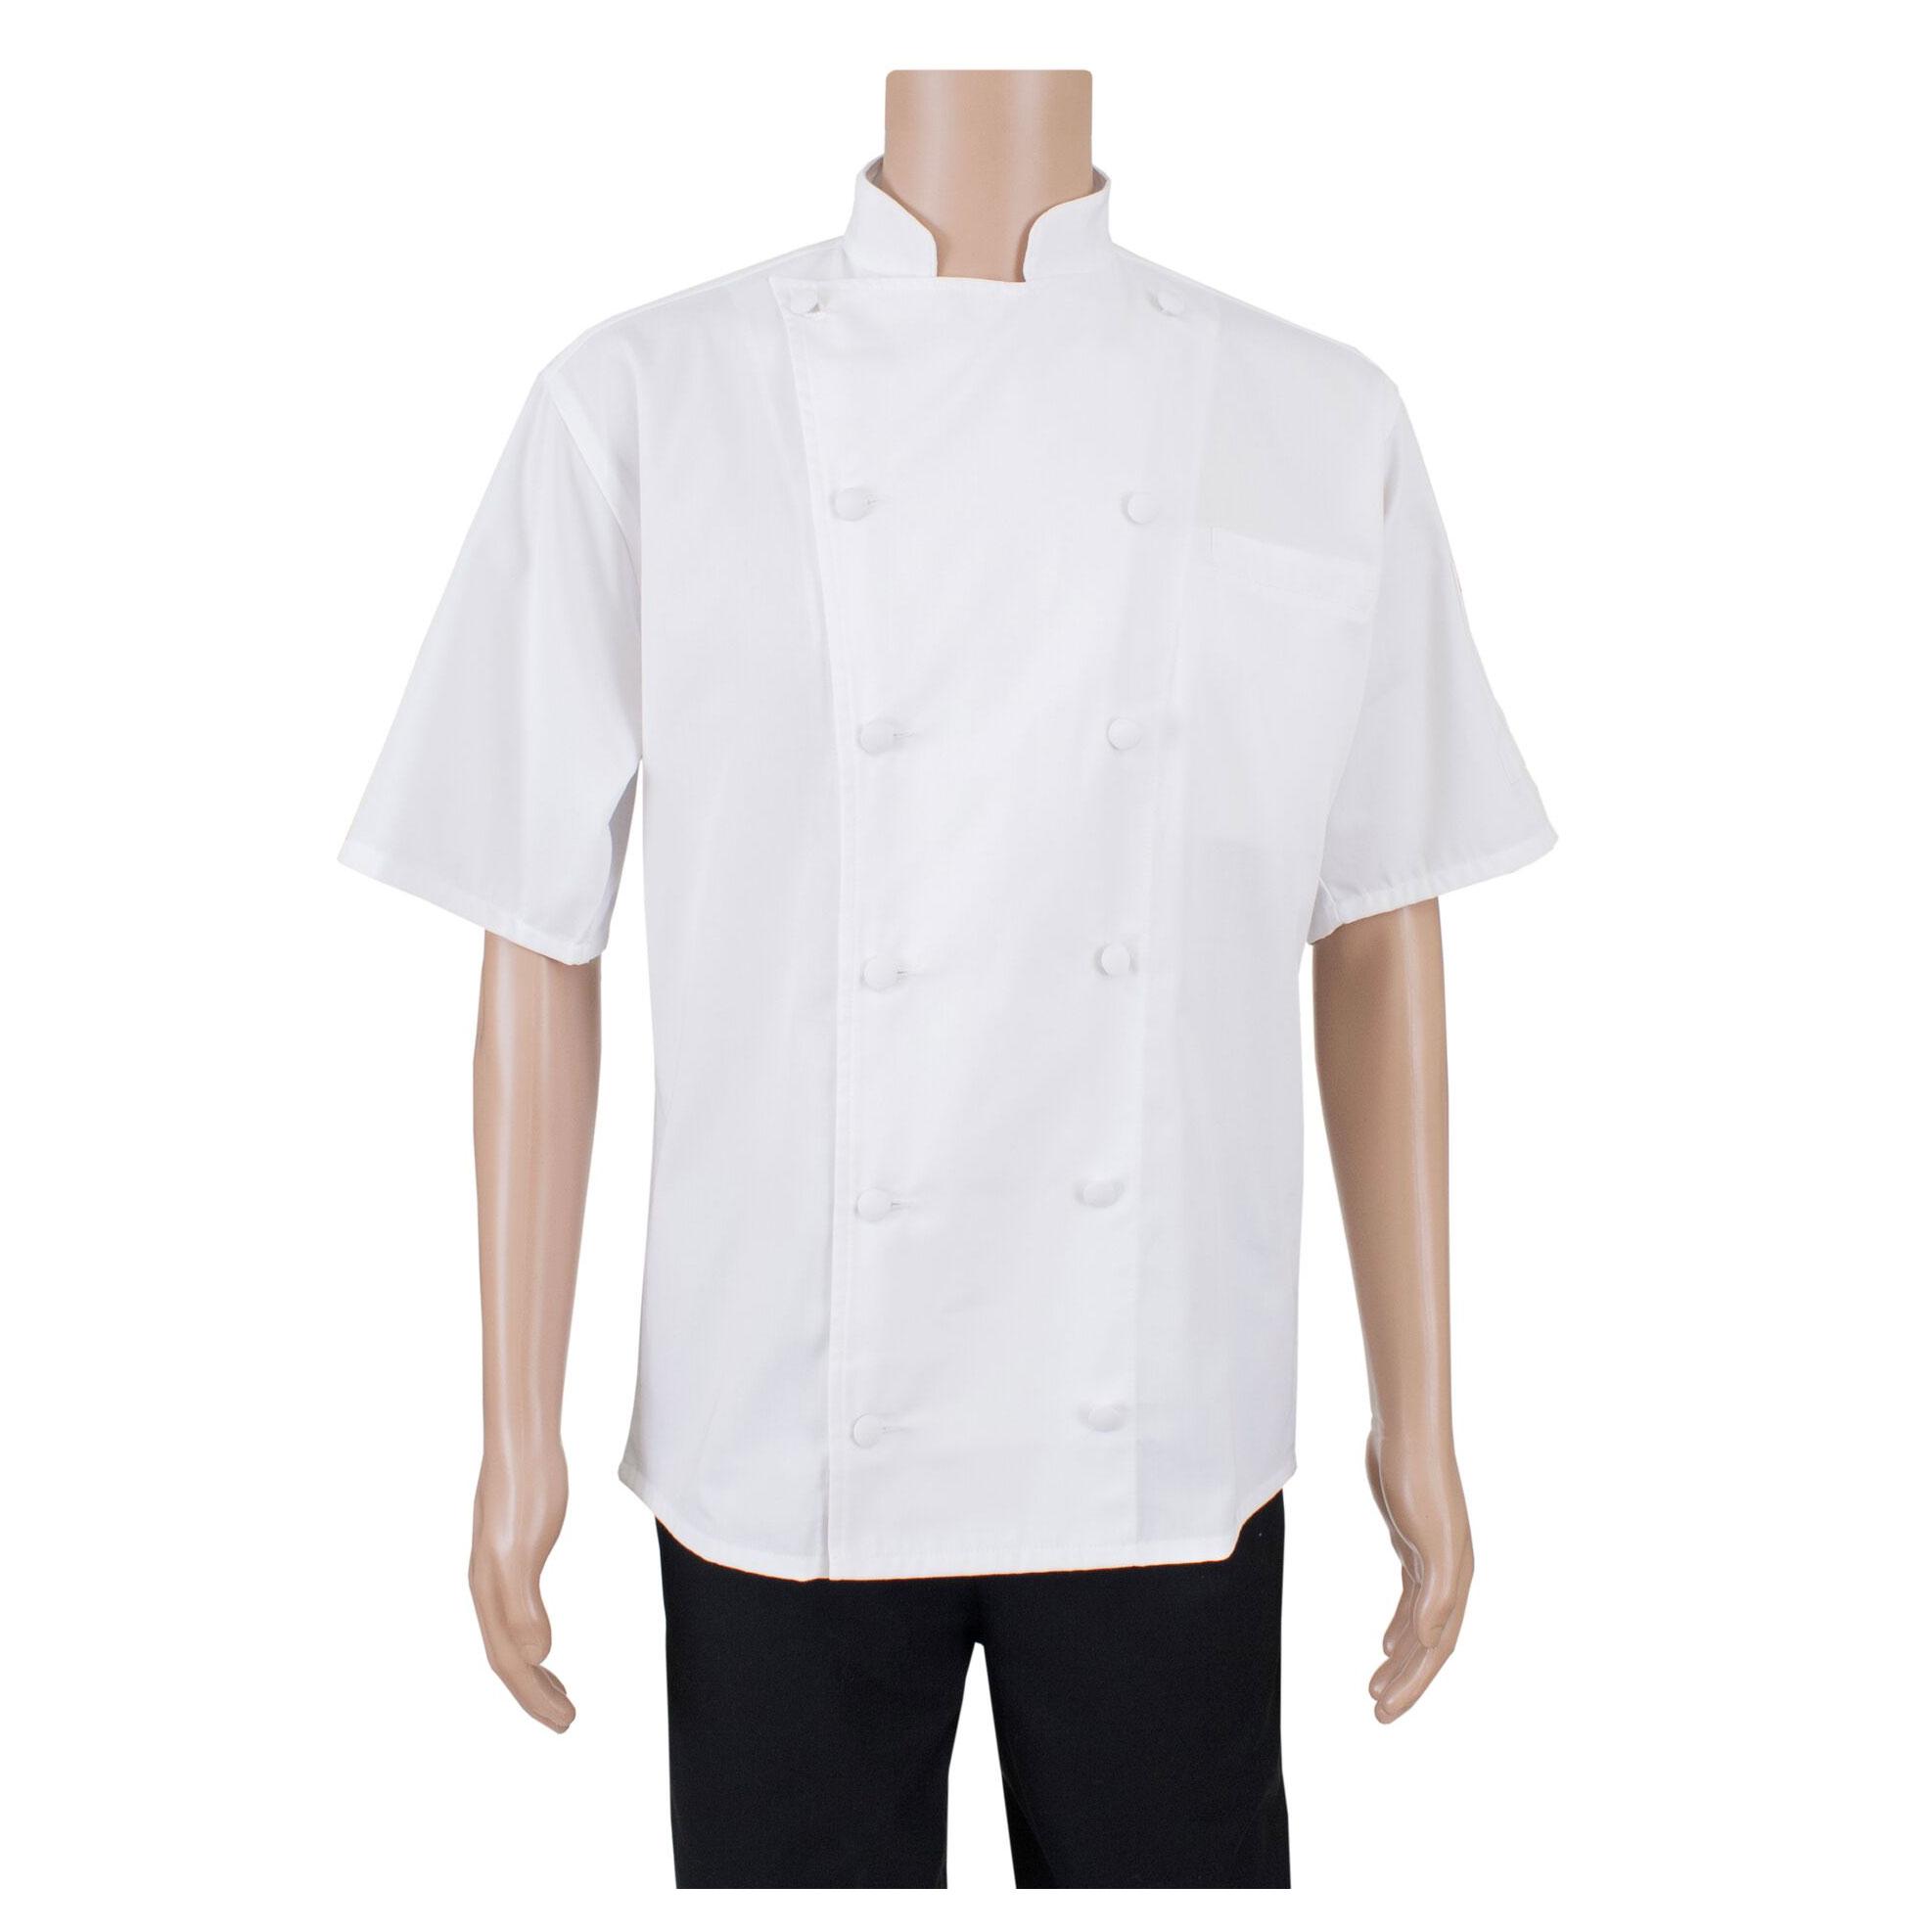 John Ritzenthaler Company RZSSWHSM chef's coat